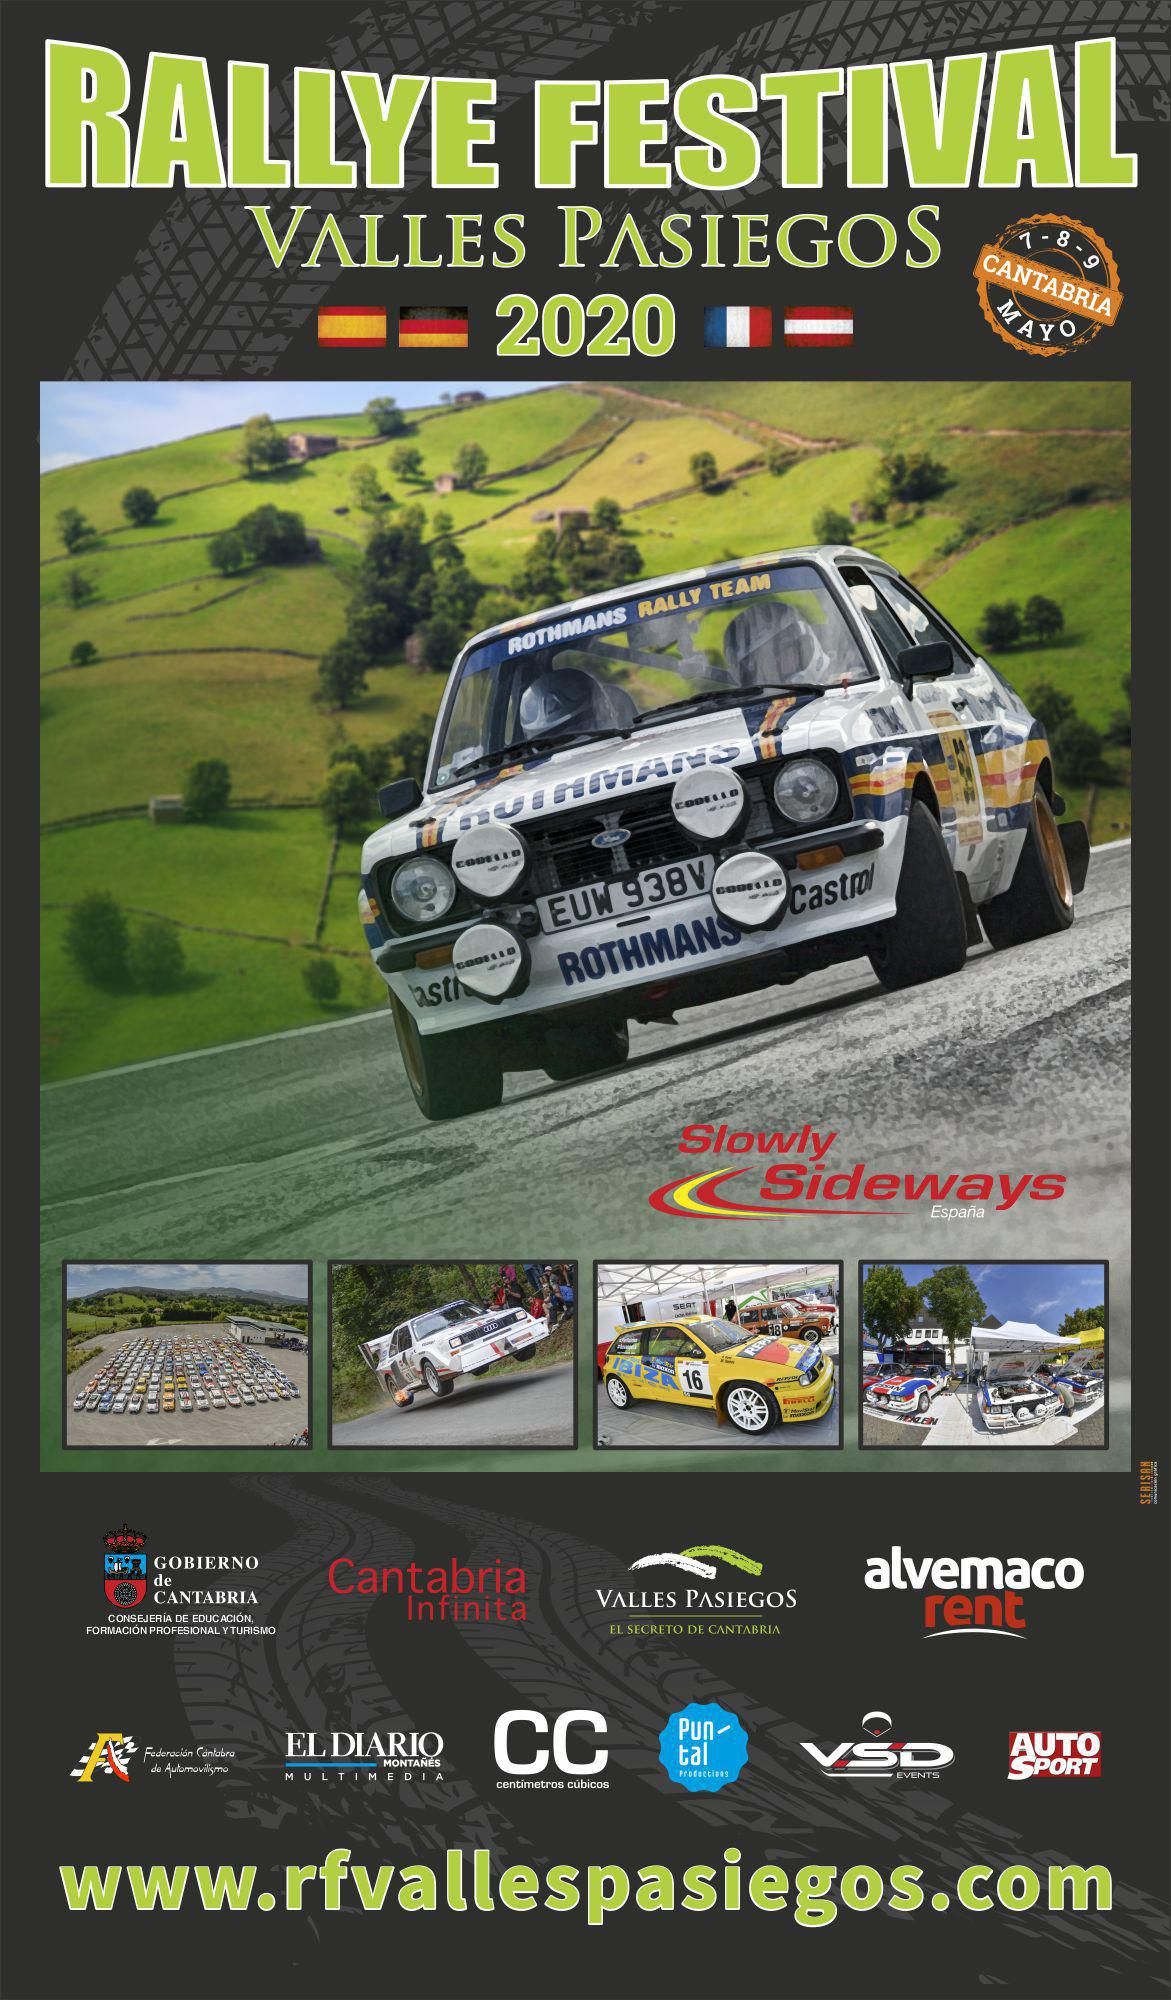 Cartel Rallye Festival Valles Pasiegos